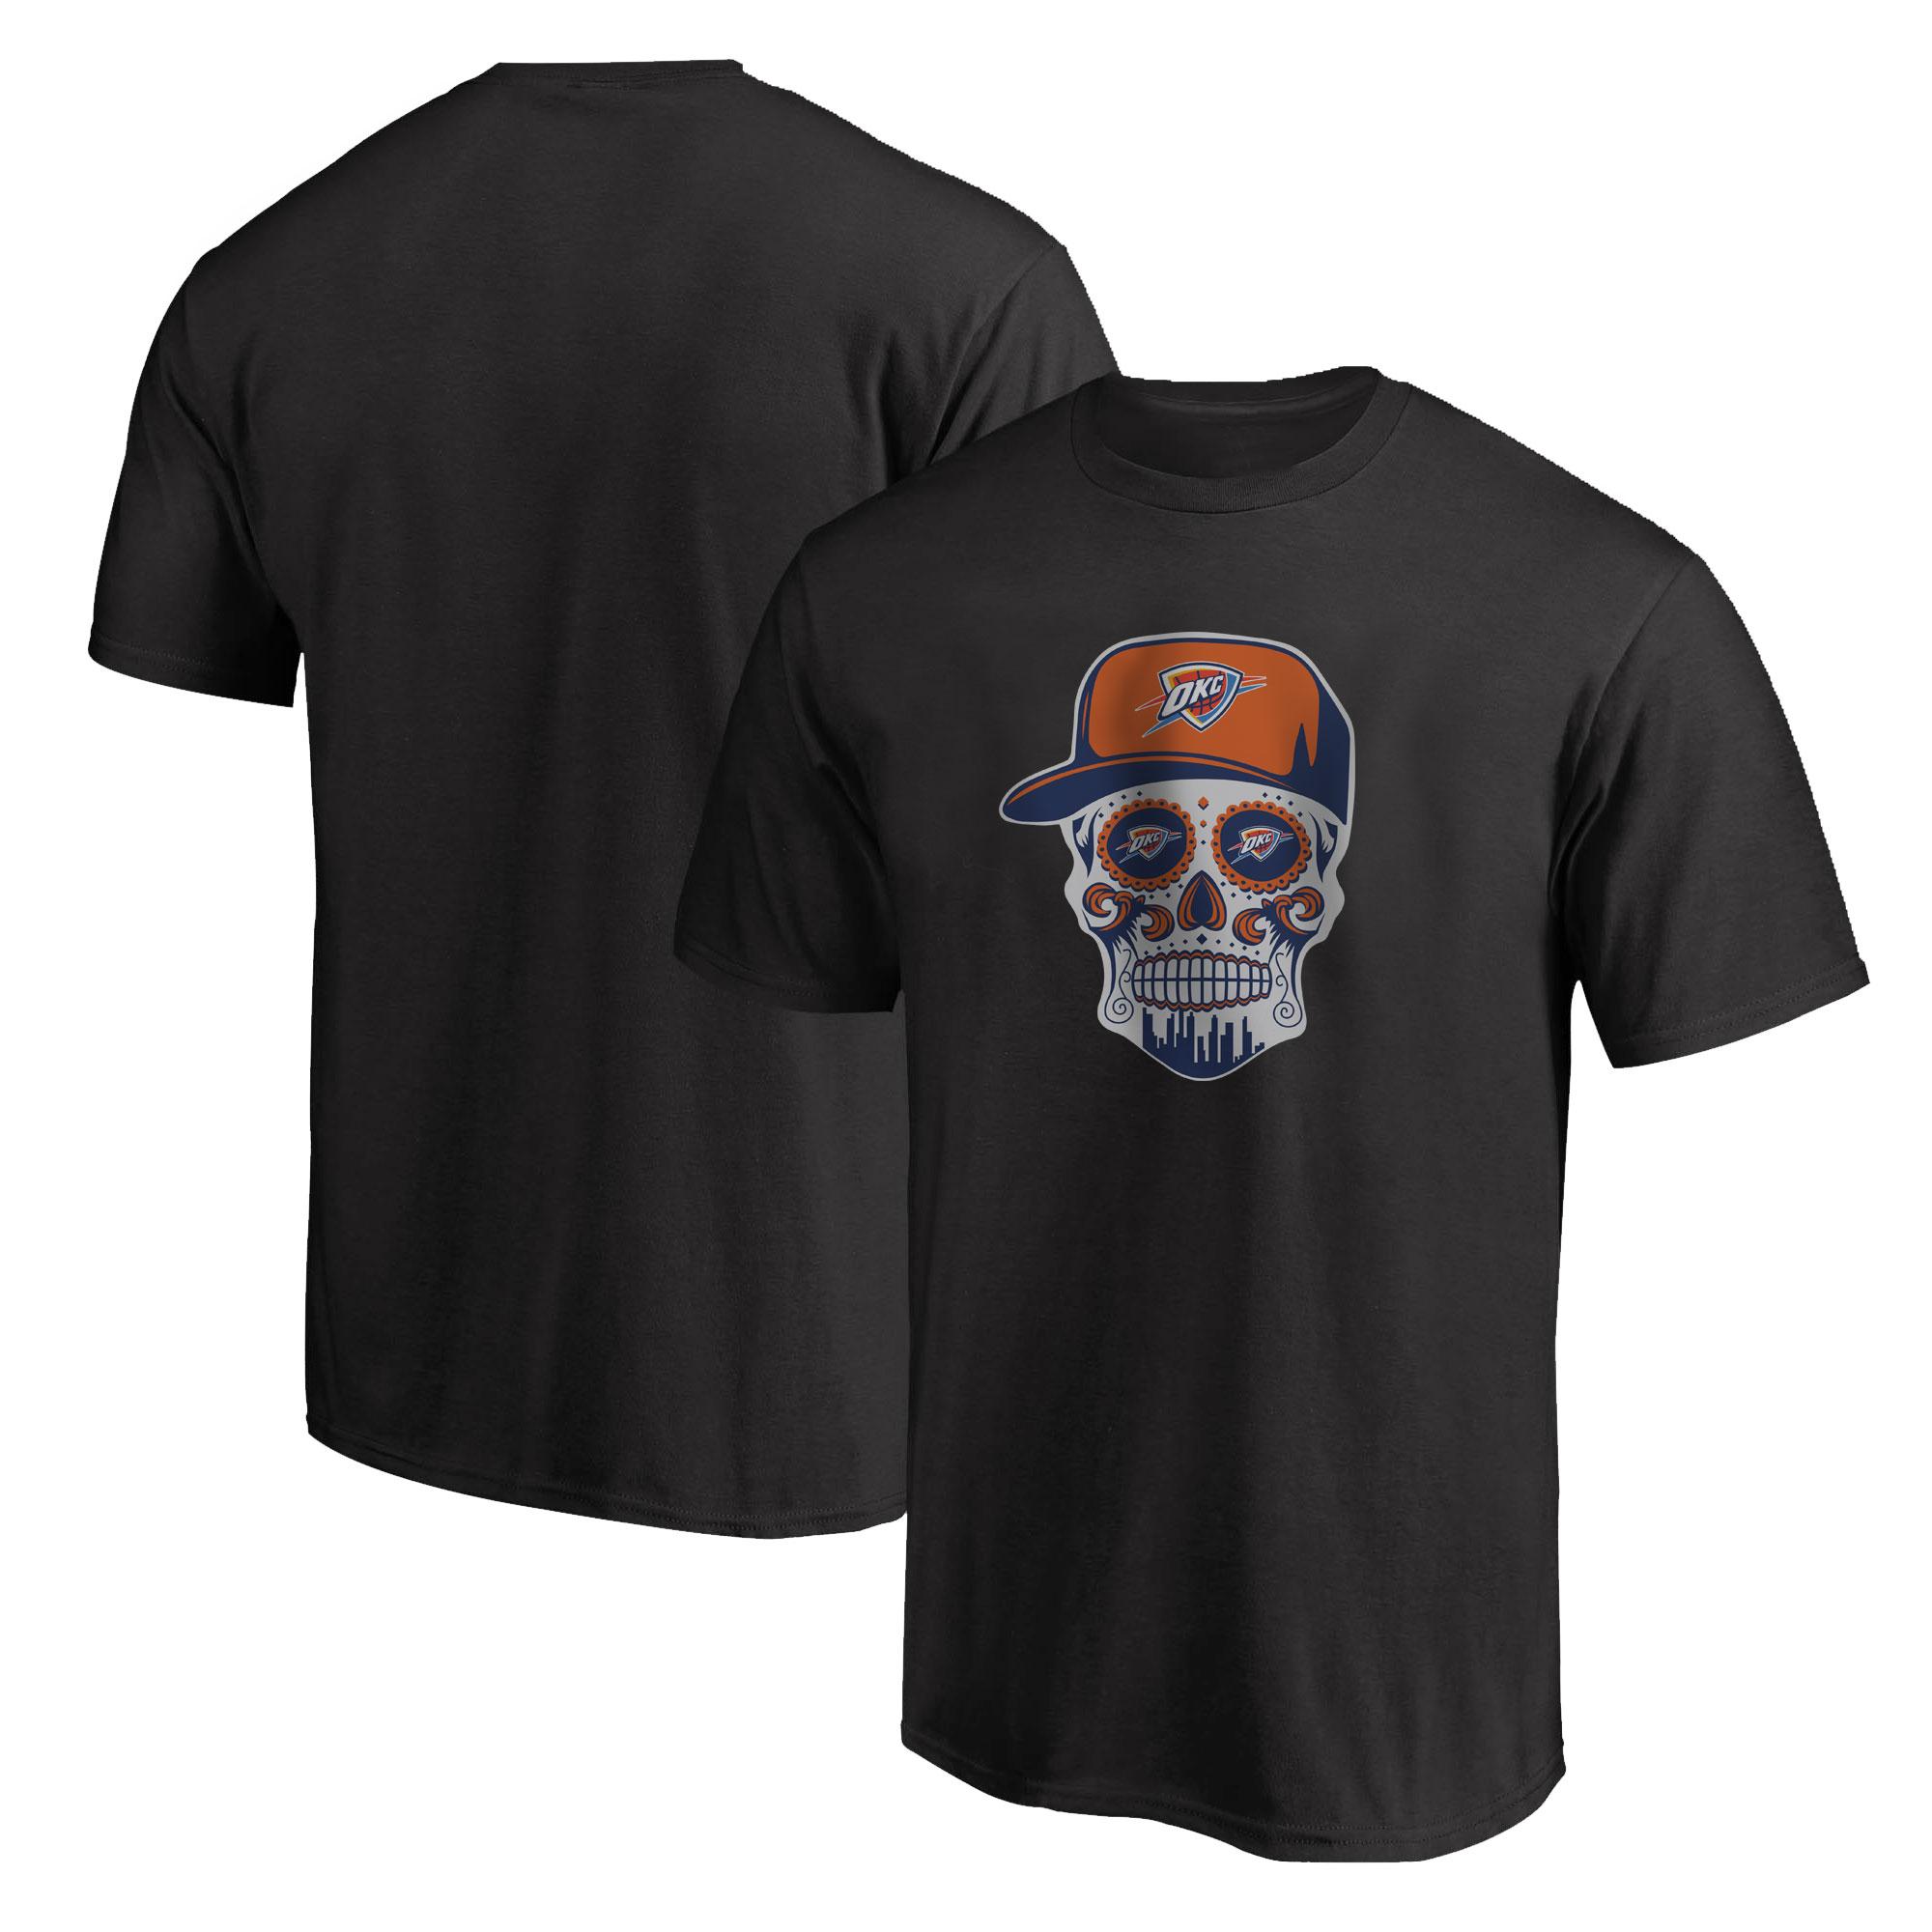 Thunder Skull Tshirt (TSH-BLC-NP-459-NBA-OKC-SKULL)